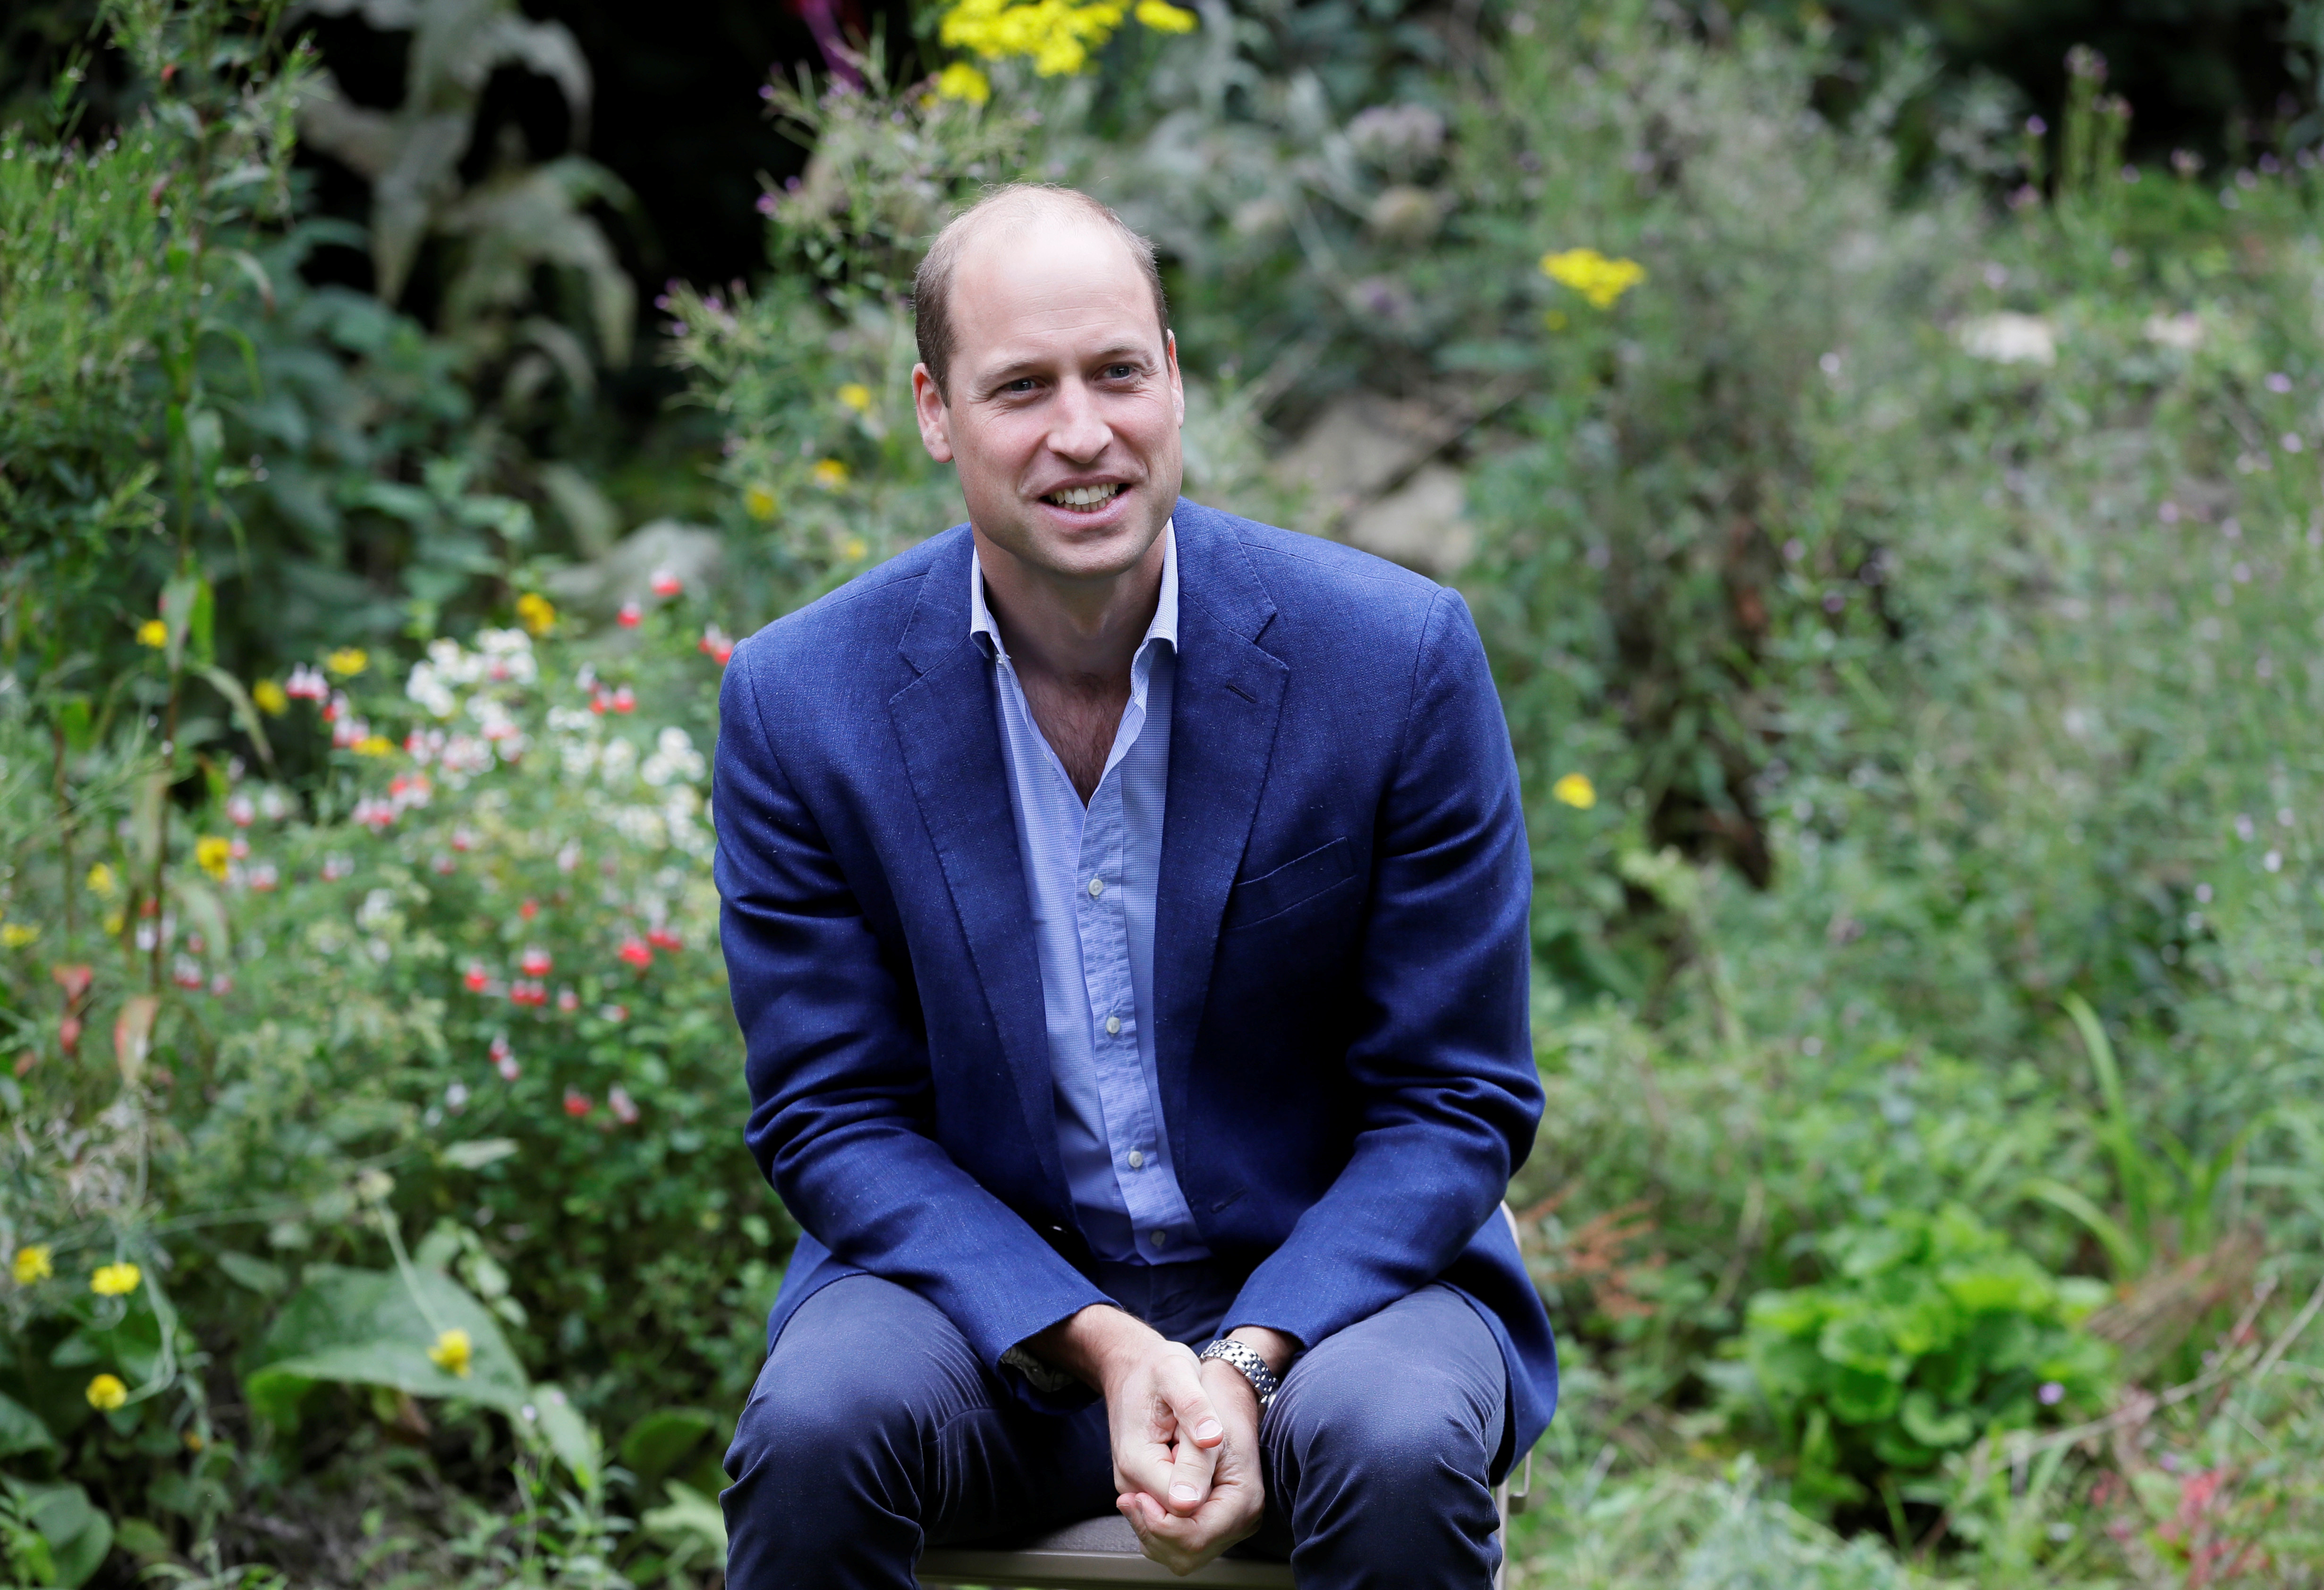 The Duke of Cambridge earthshot environment change prize multi million climate change